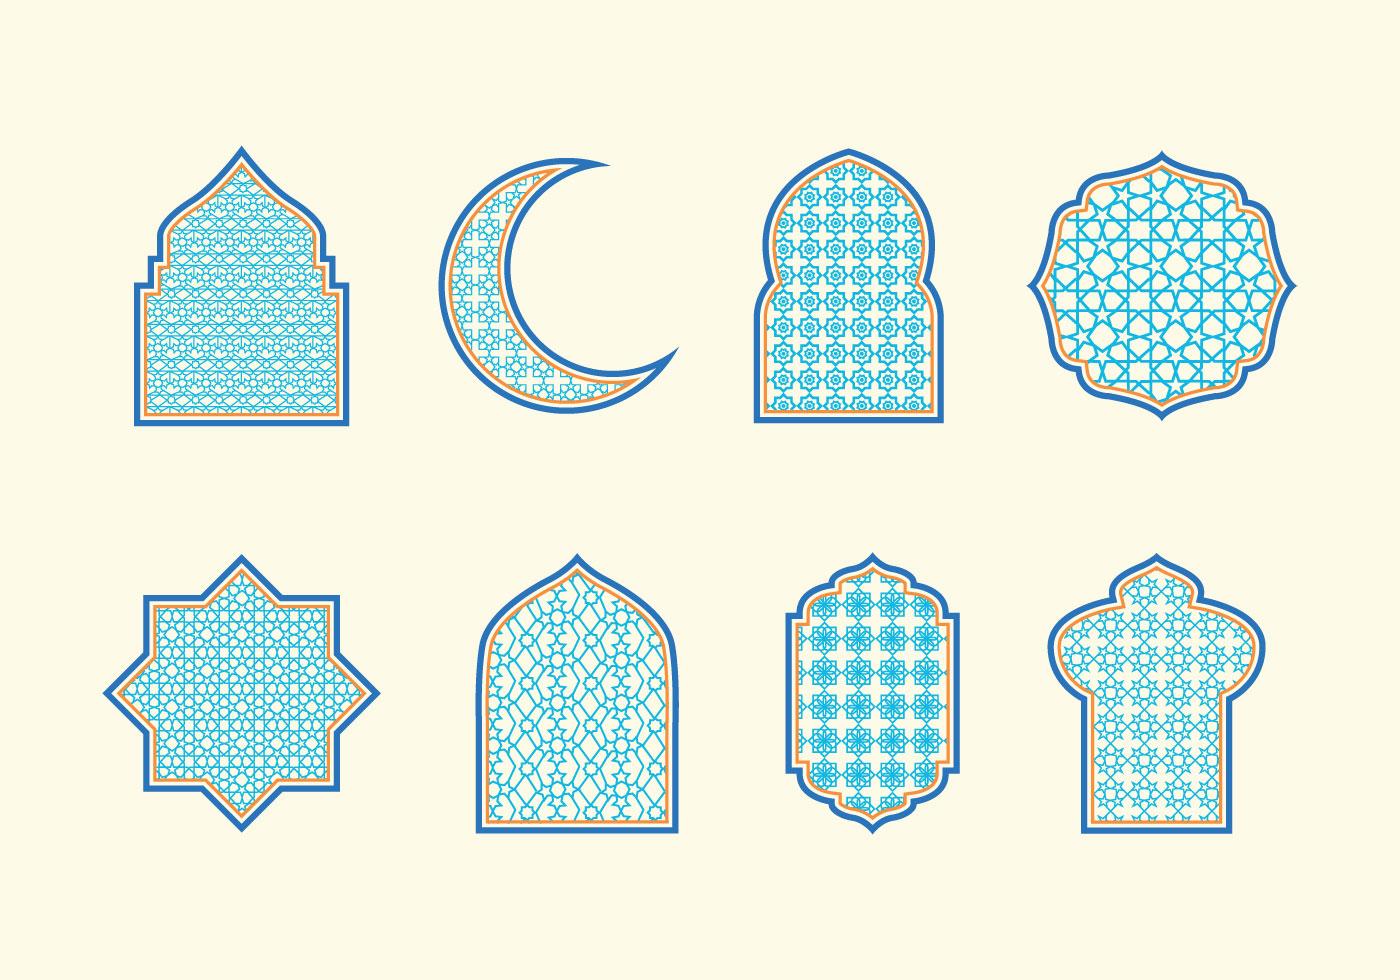 Islamic Ornaments Vector Download Free Vector Art Stock